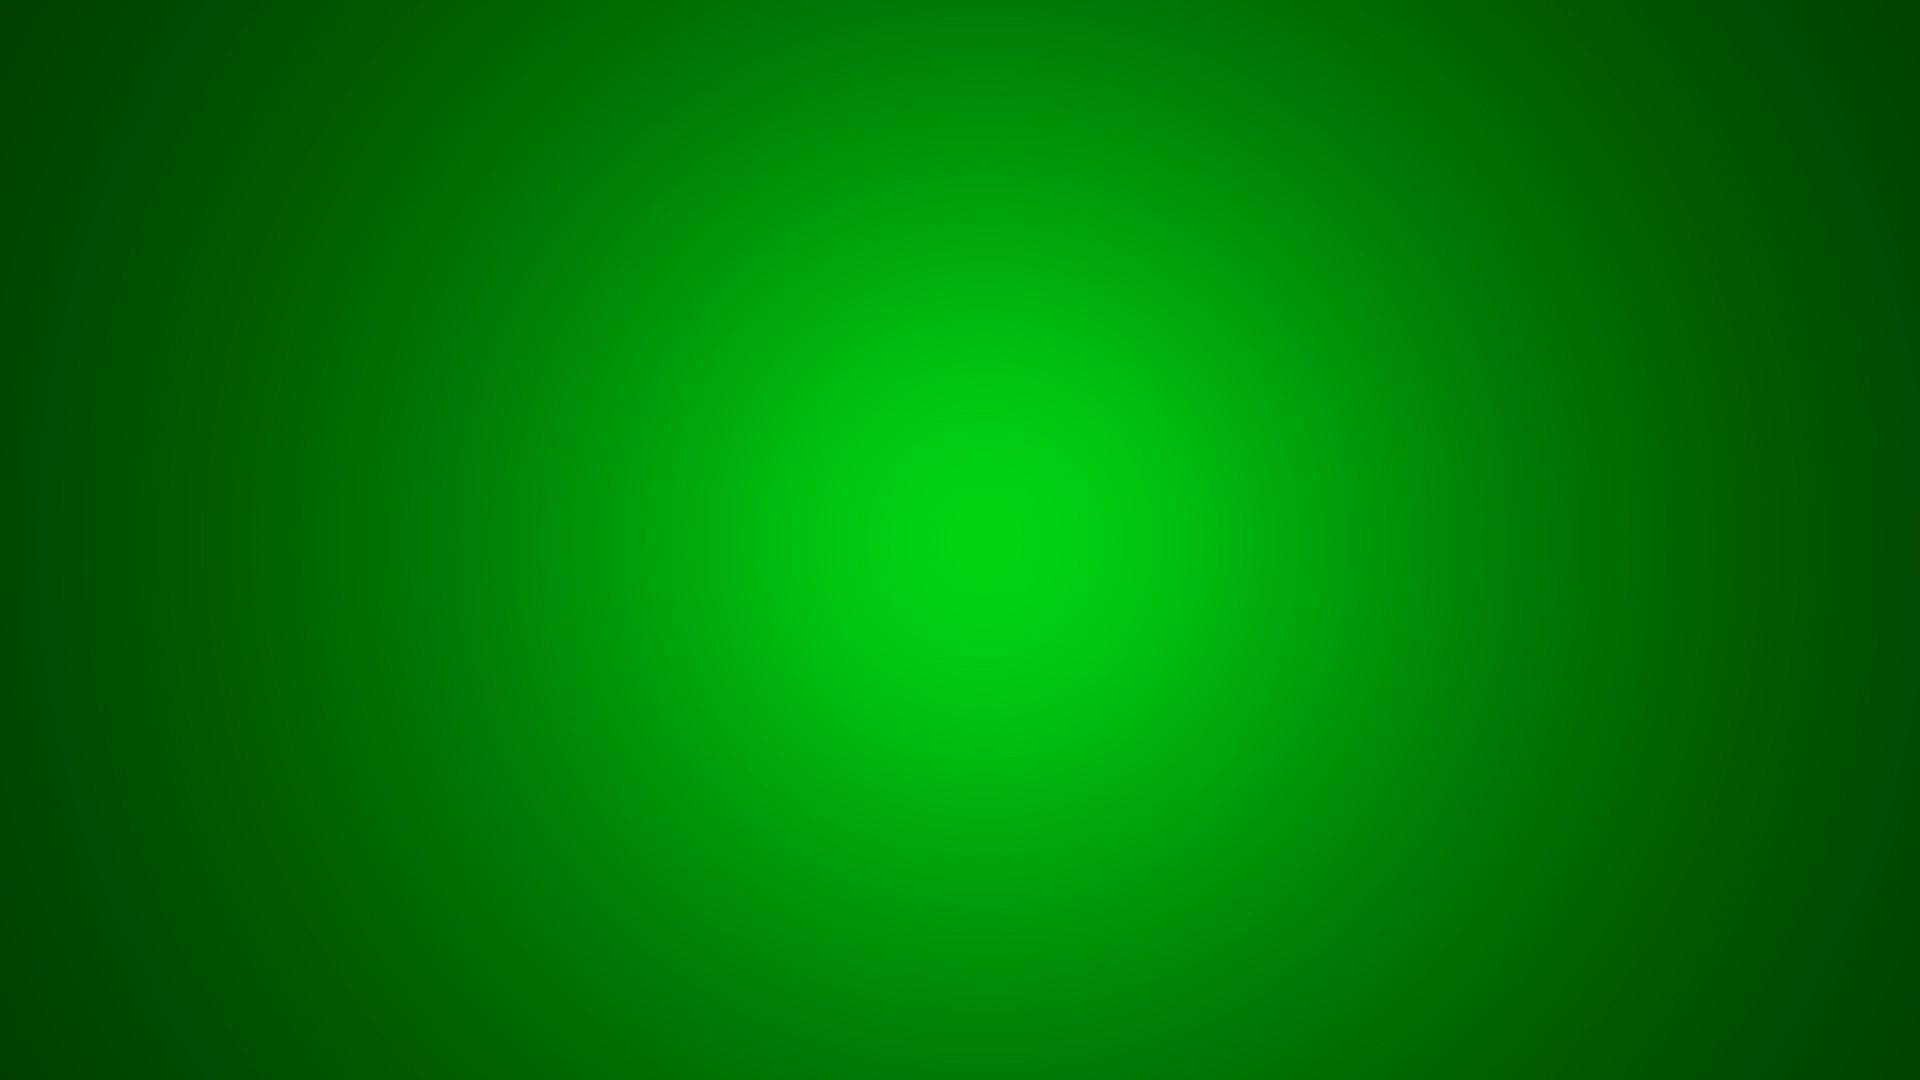 Special Green Wallpaper